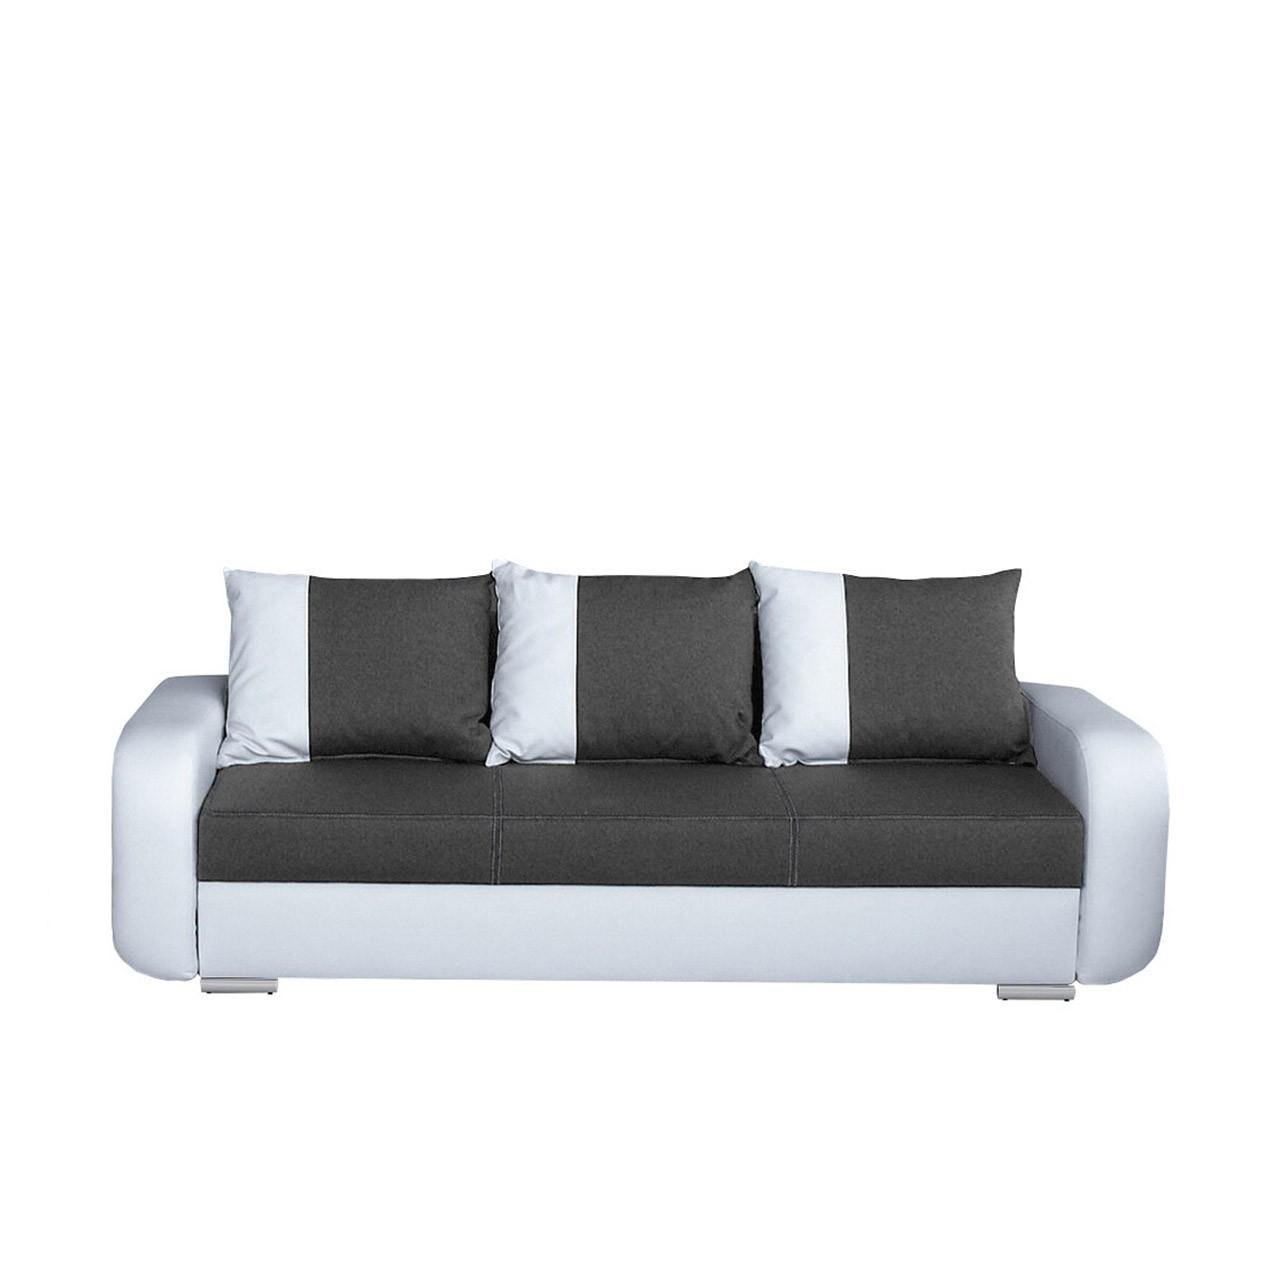 sofa danny 3 mit bettkasten mirjan24. Black Bedroom Furniture Sets. Home Design Ideas